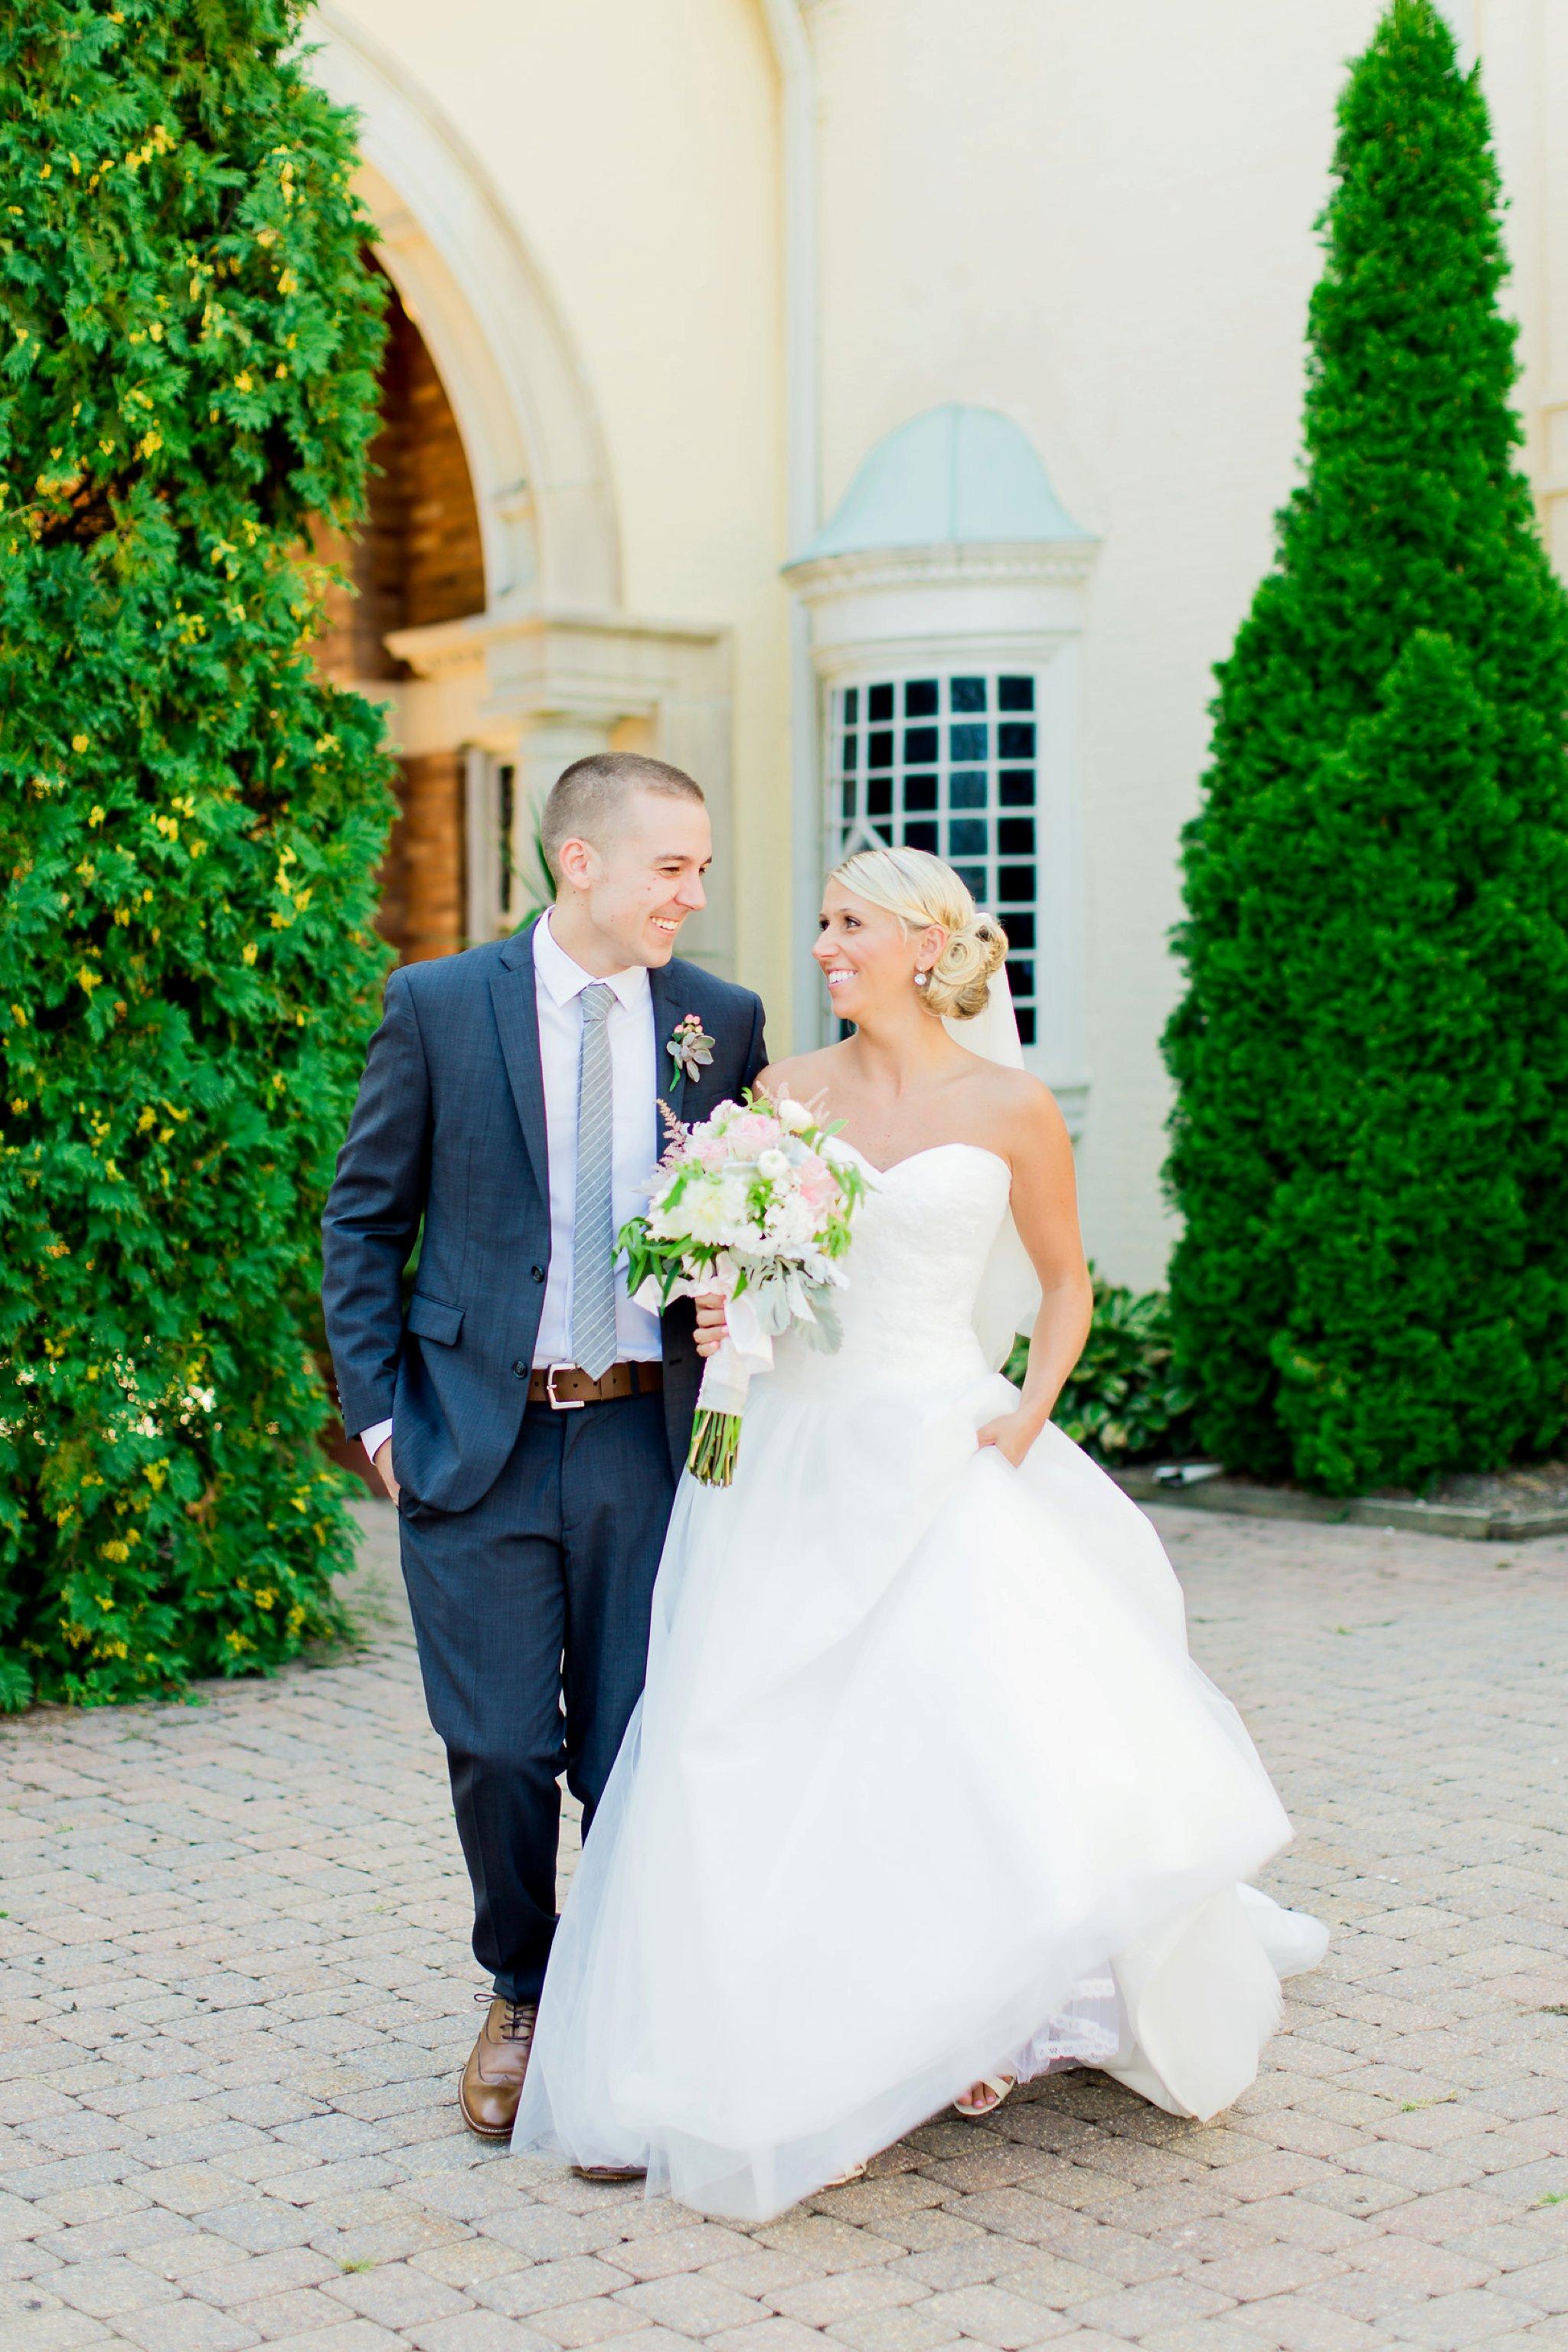 Evergreen Museum & Library Wedding Photos Baltimore Wedding Photographer Kim & Max Megan Kelsey Photography-92.jpg